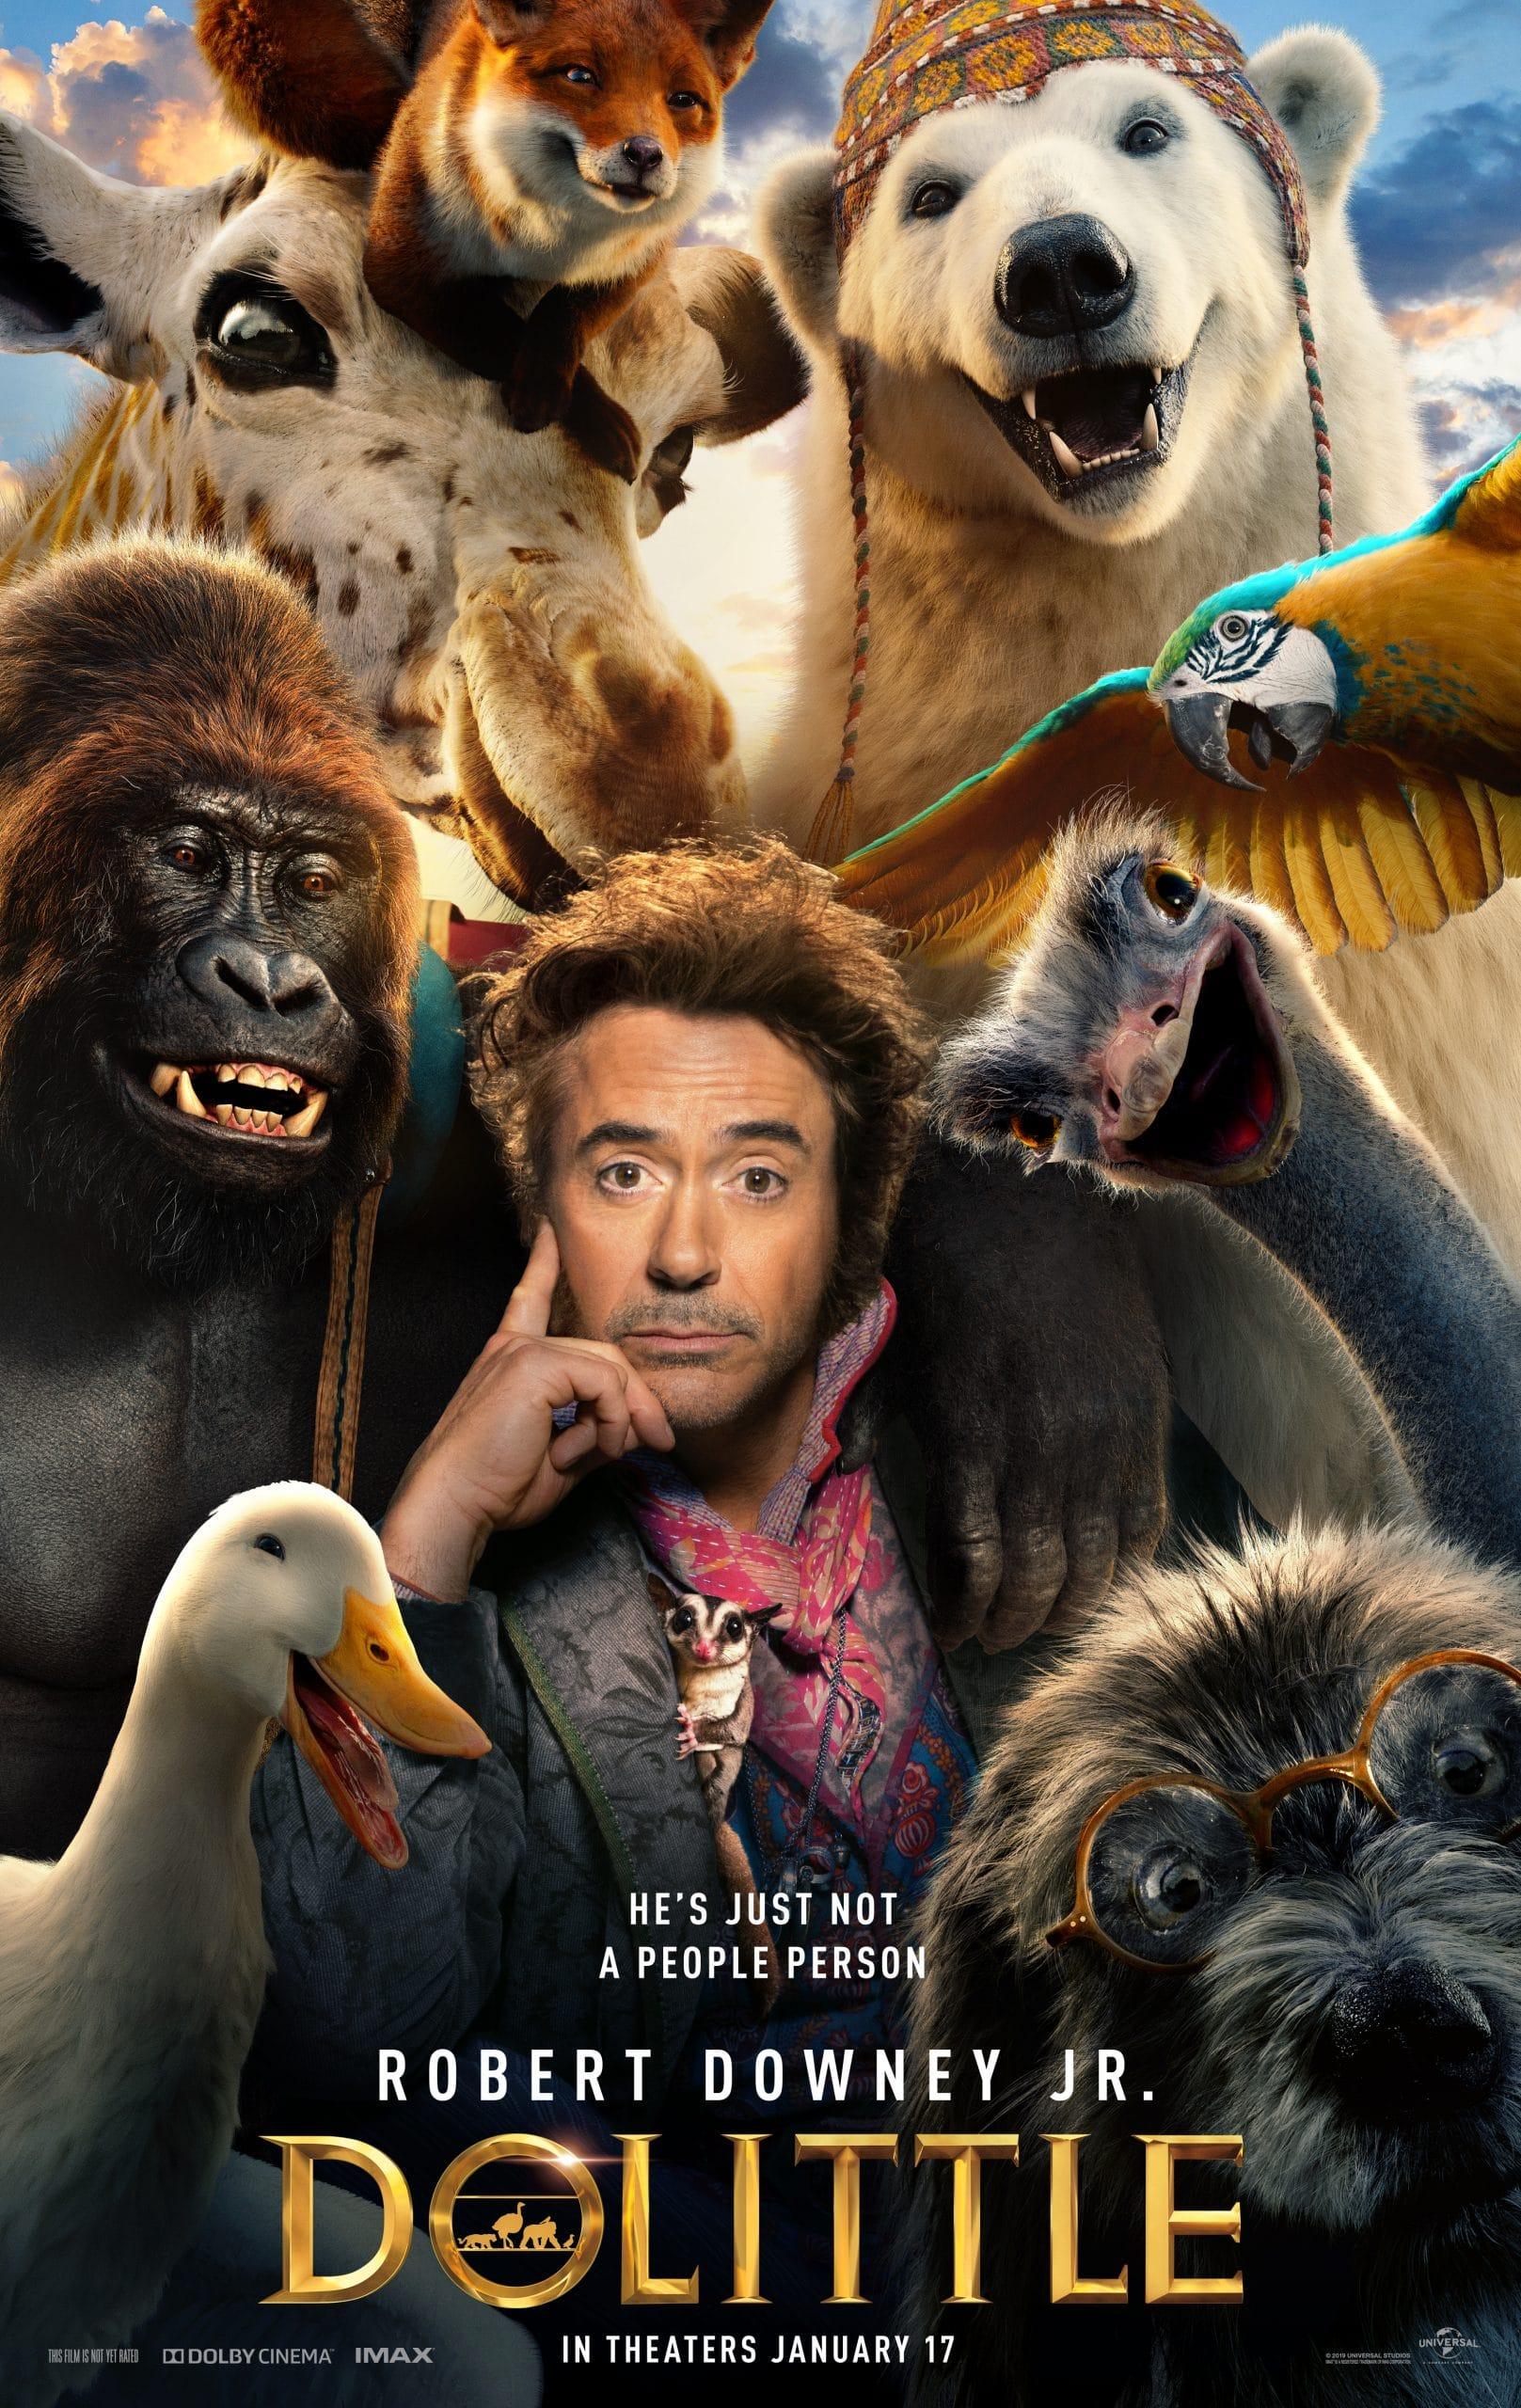 Robert Downey Jr. – Dolittle